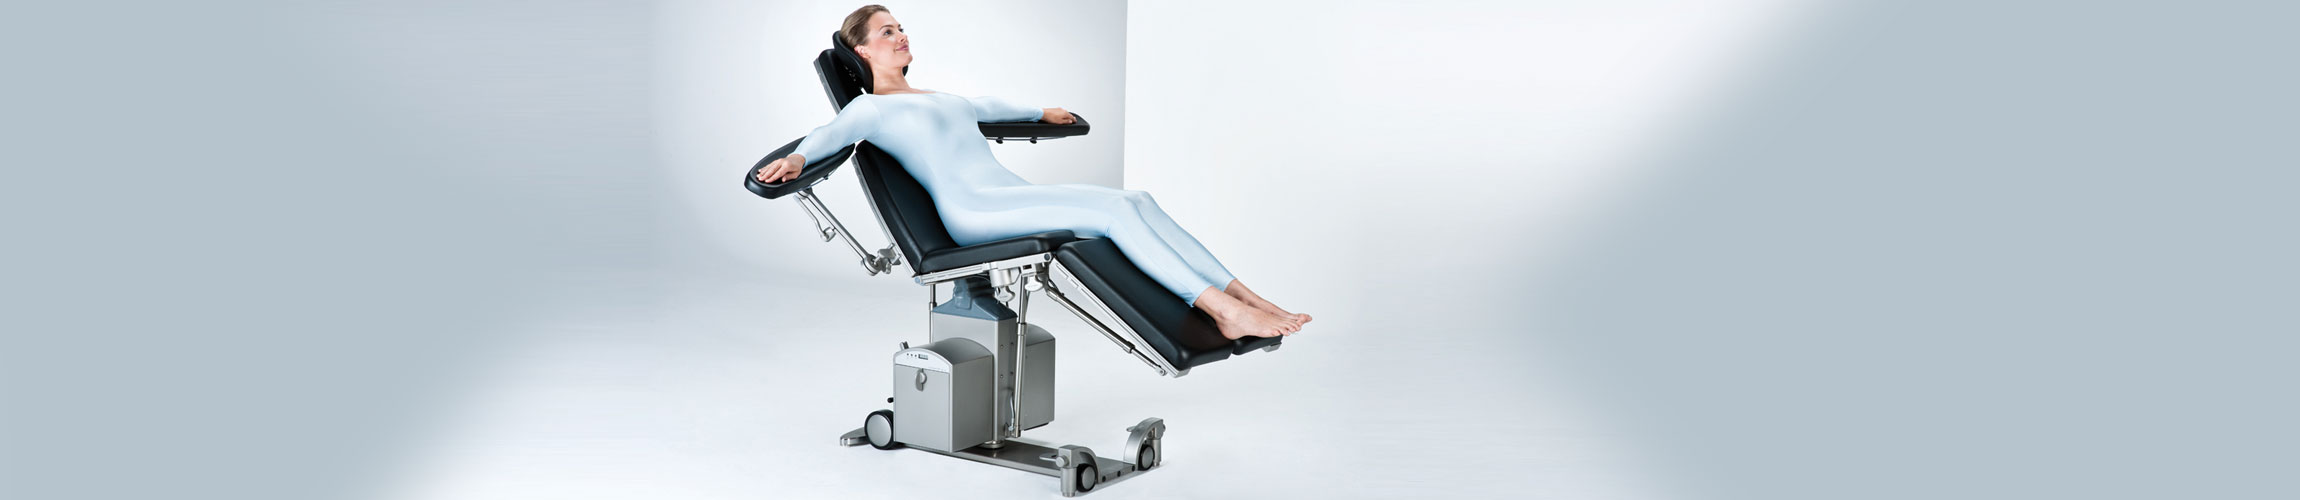 dermatolog-masasi